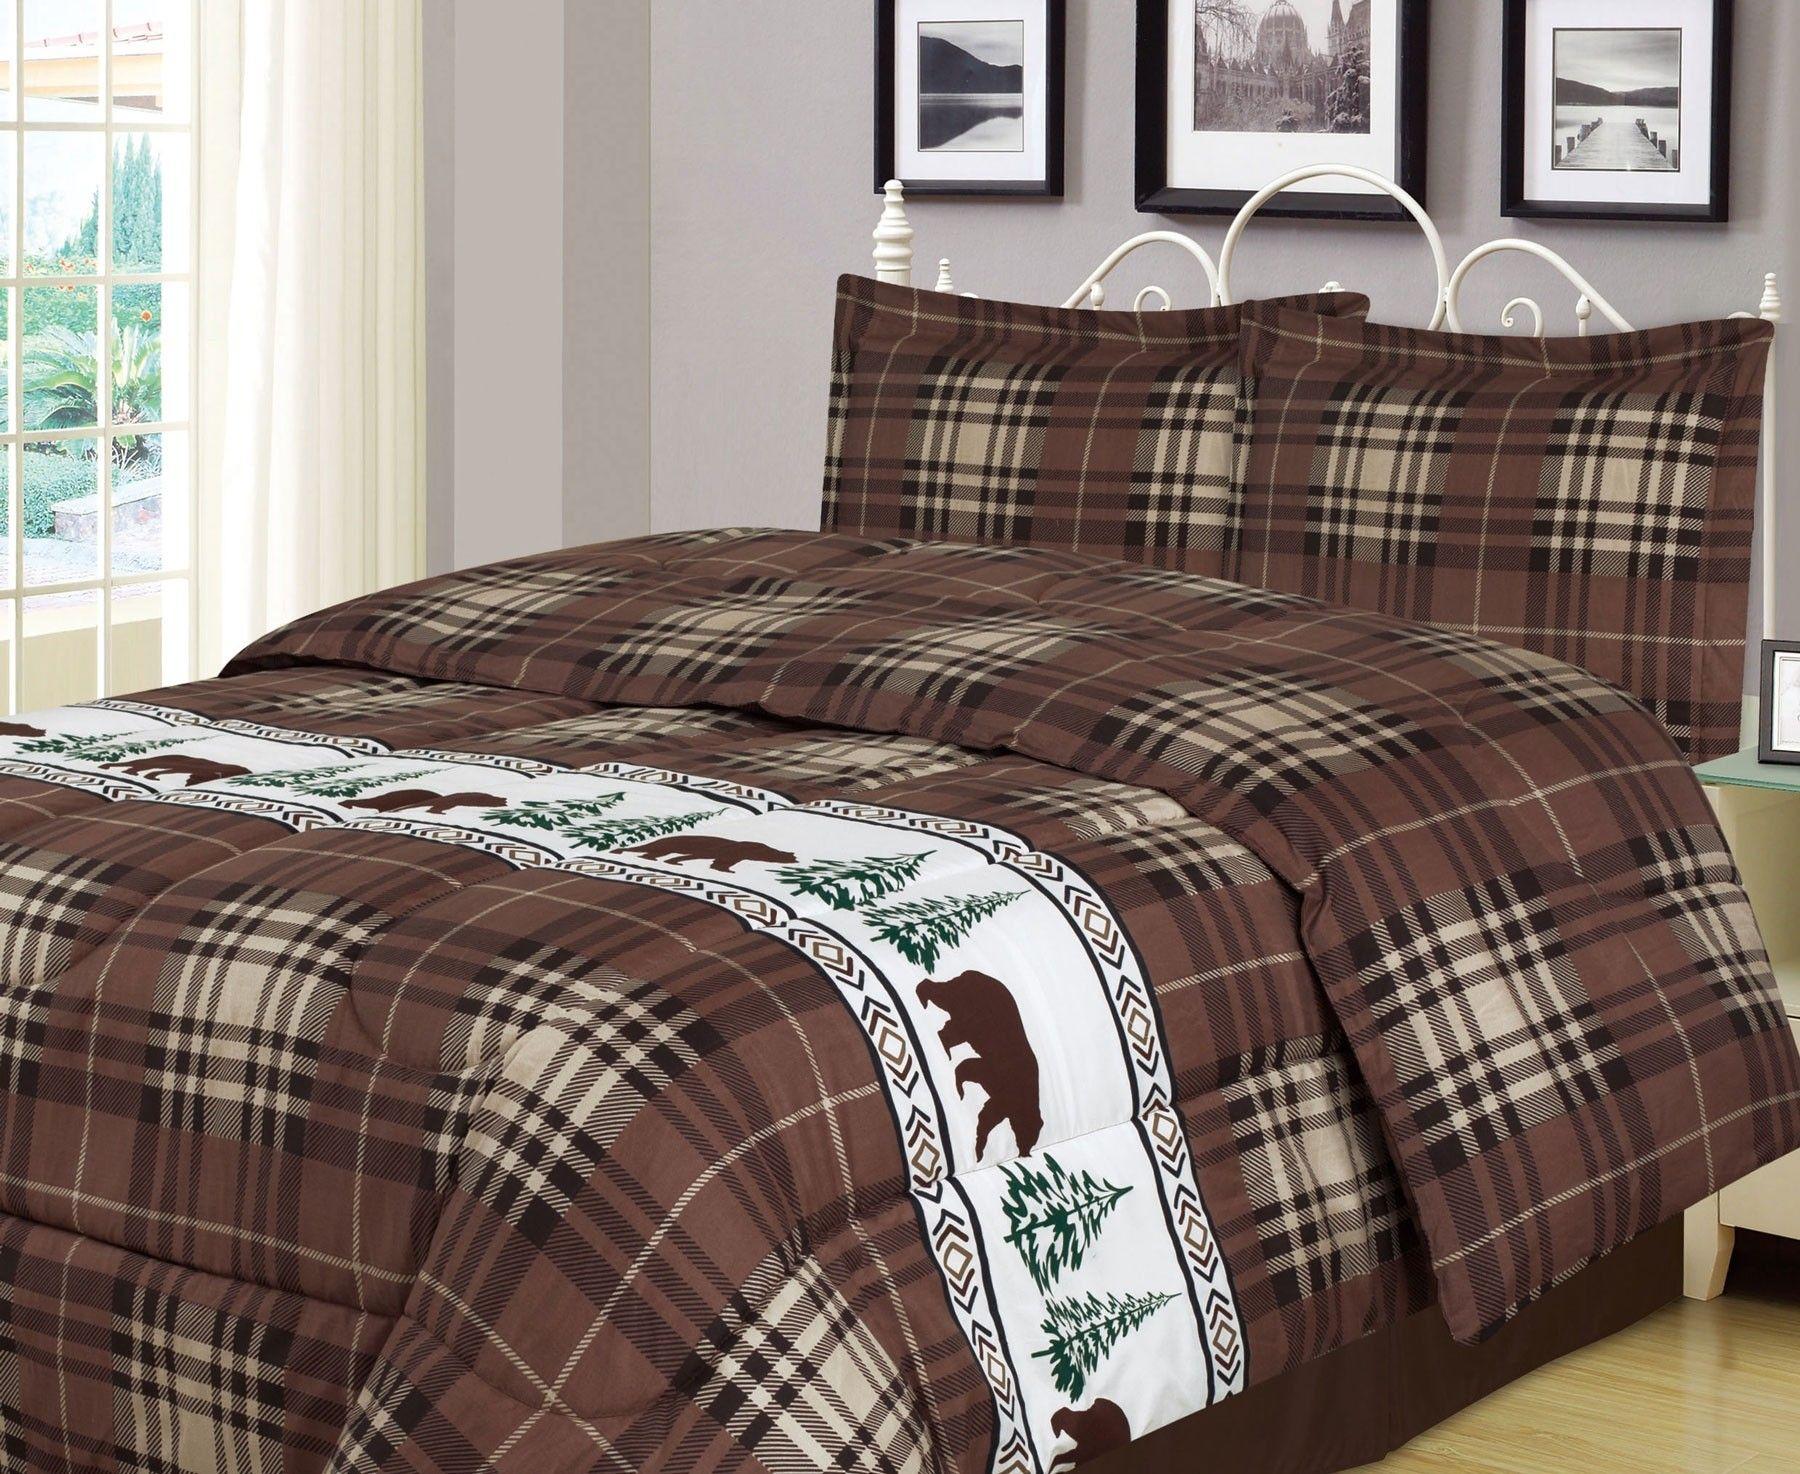 comforters sets boy set bedding teen for cabin comforter cool cabins boys